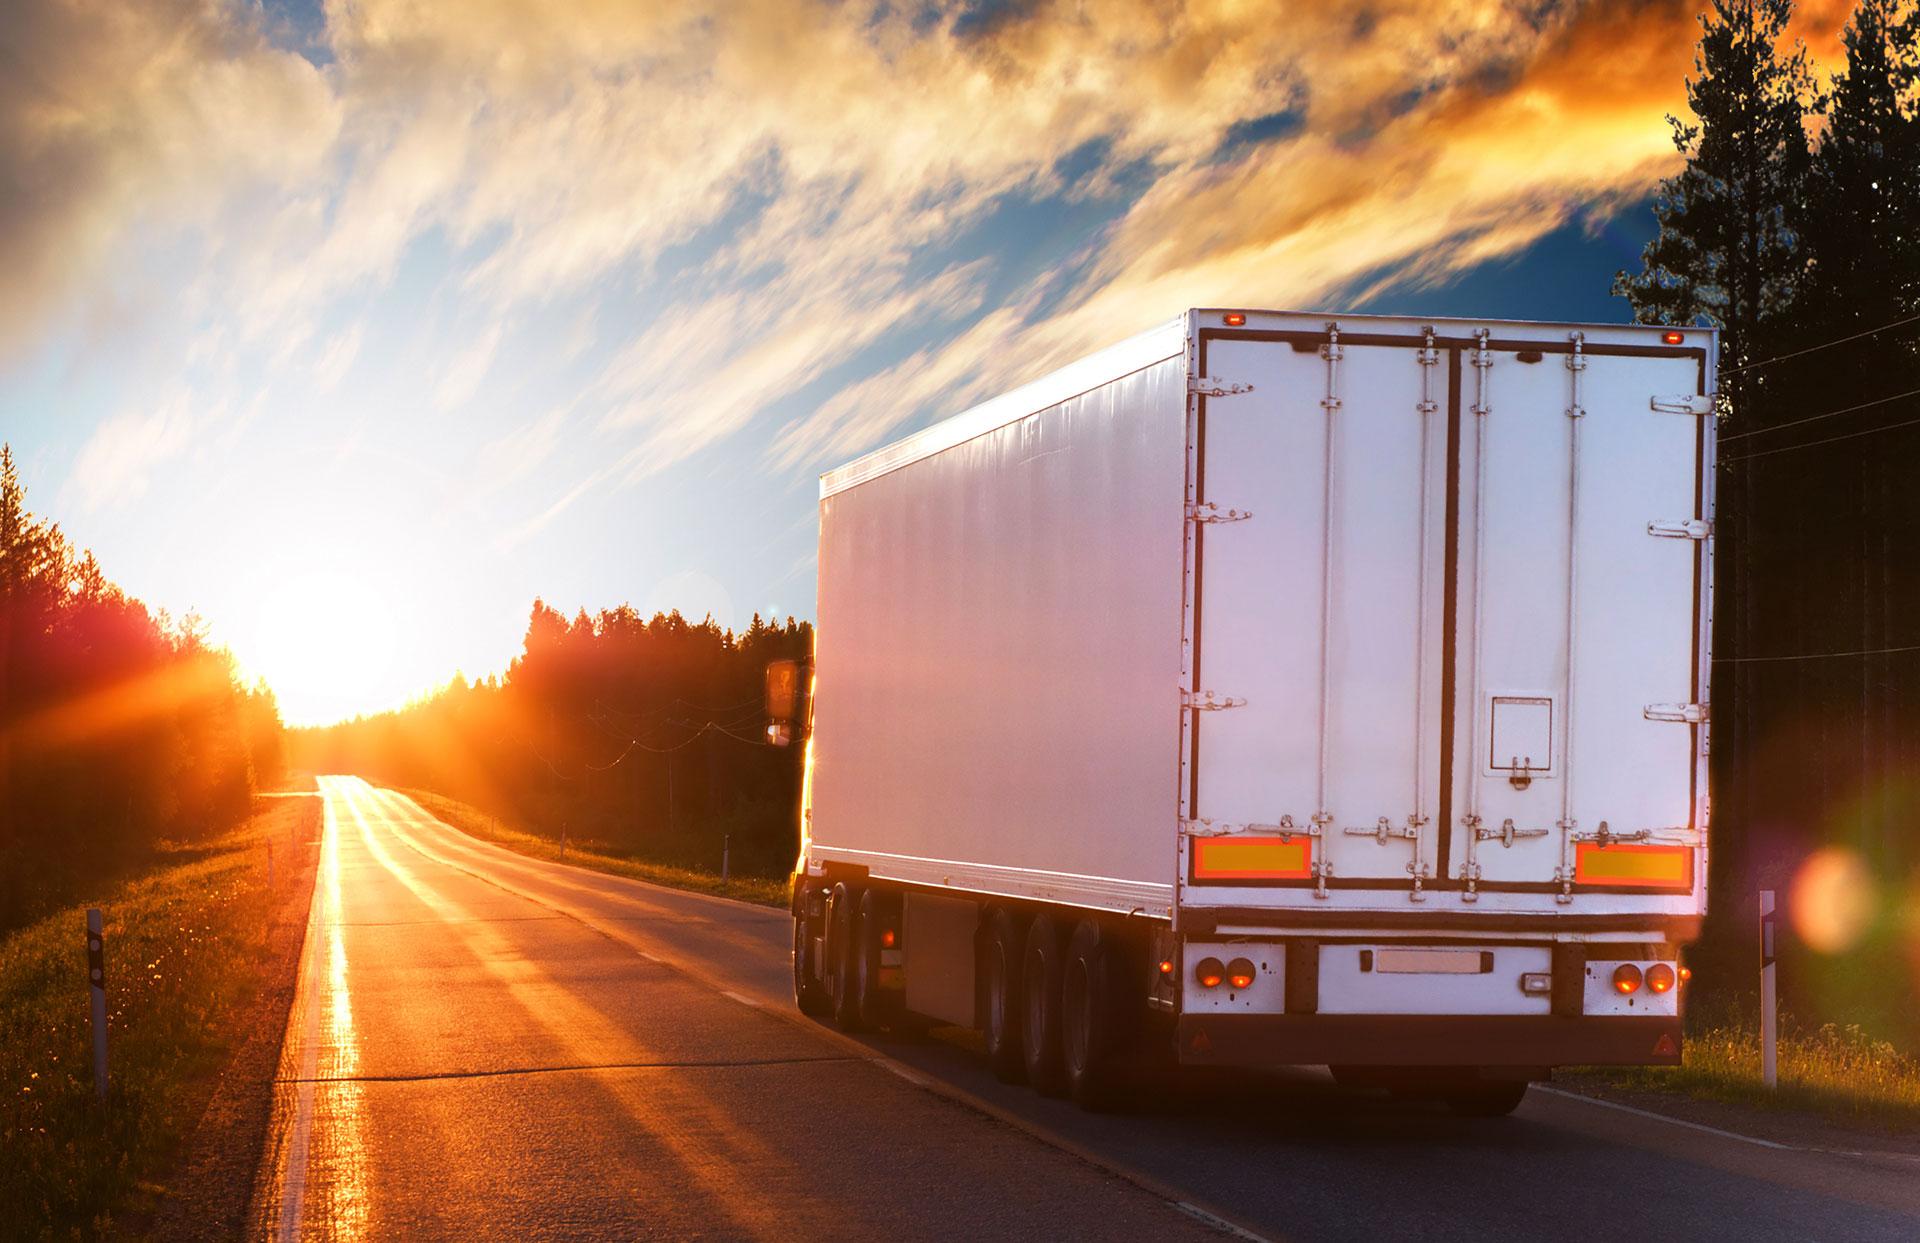 camion allalba 002 1920x1080 v3